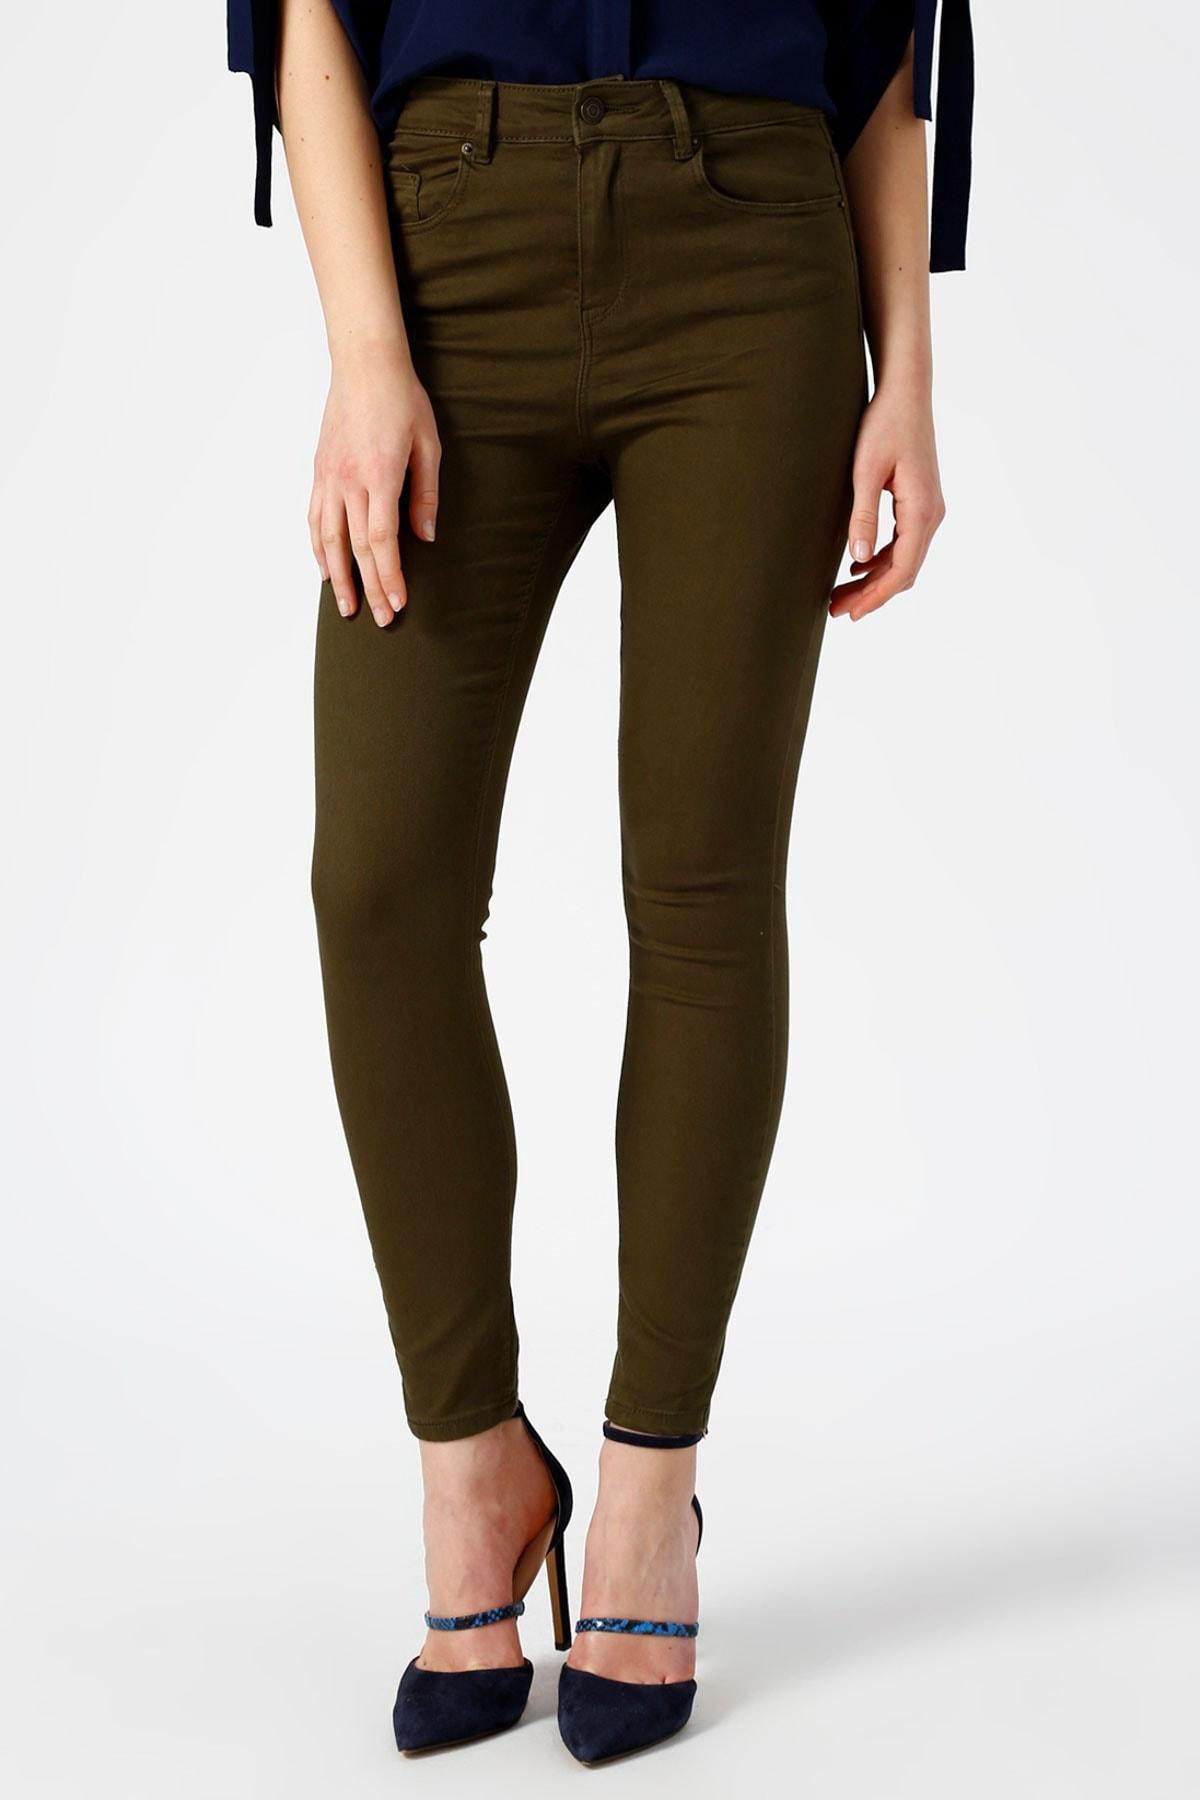 Vero Moda Kadın Yeşil Dar Paça Normal Bel Pantolon 10209868 VMHOT 2